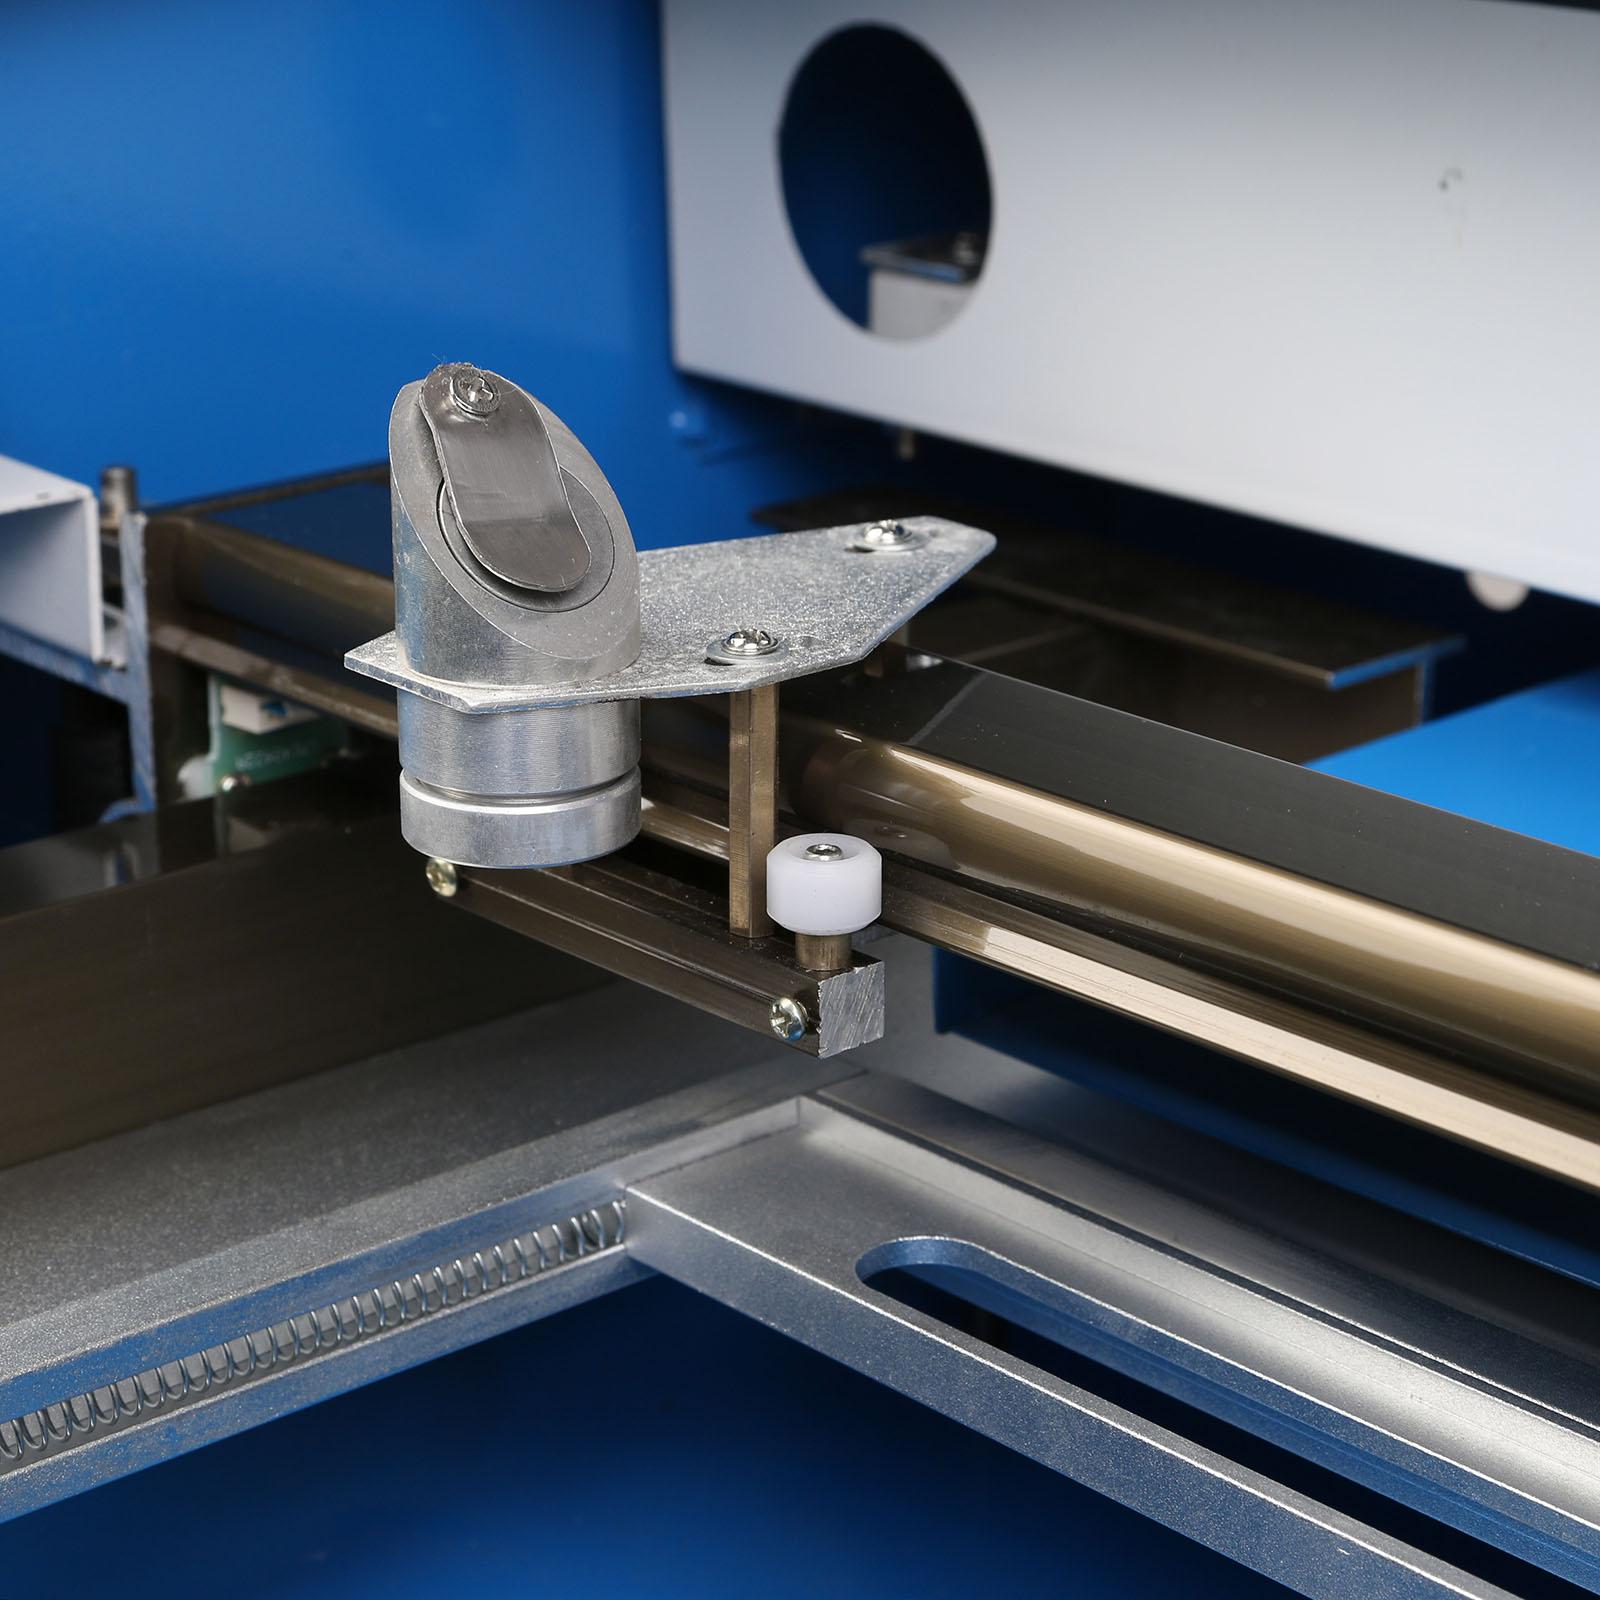 Macchina-per-Incisione-Laser-CO2-40-130W-Asse-Rotante-Tagliatrice-Incisore miniatura 21